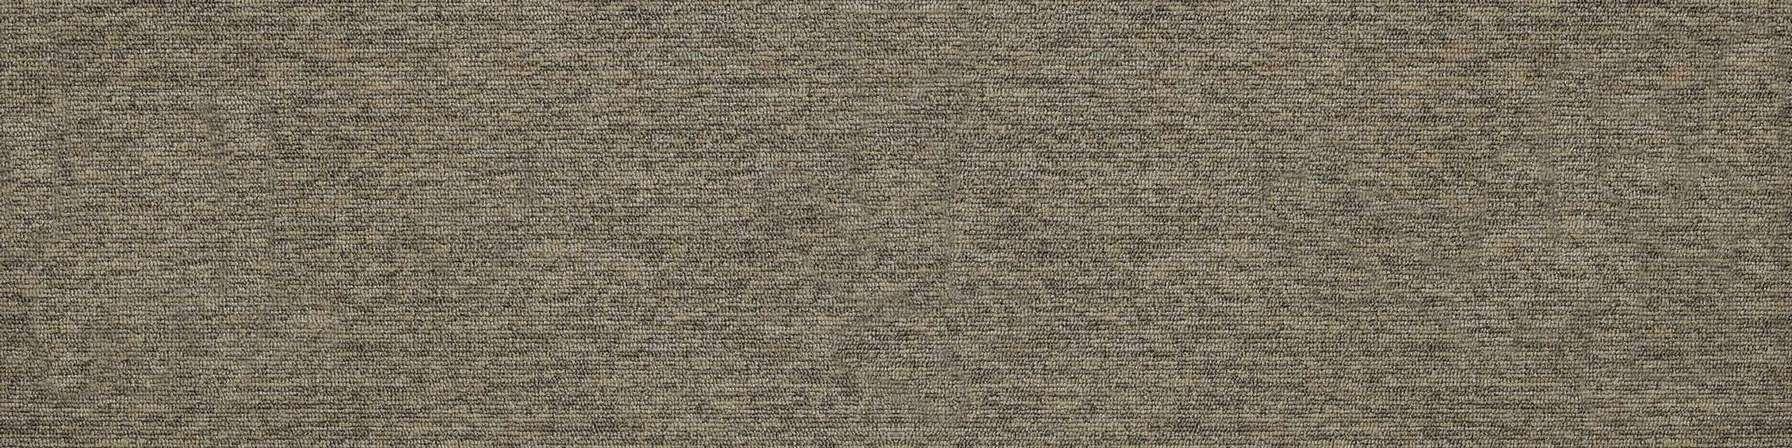 tivoli 21114 st martin sands carpet plank